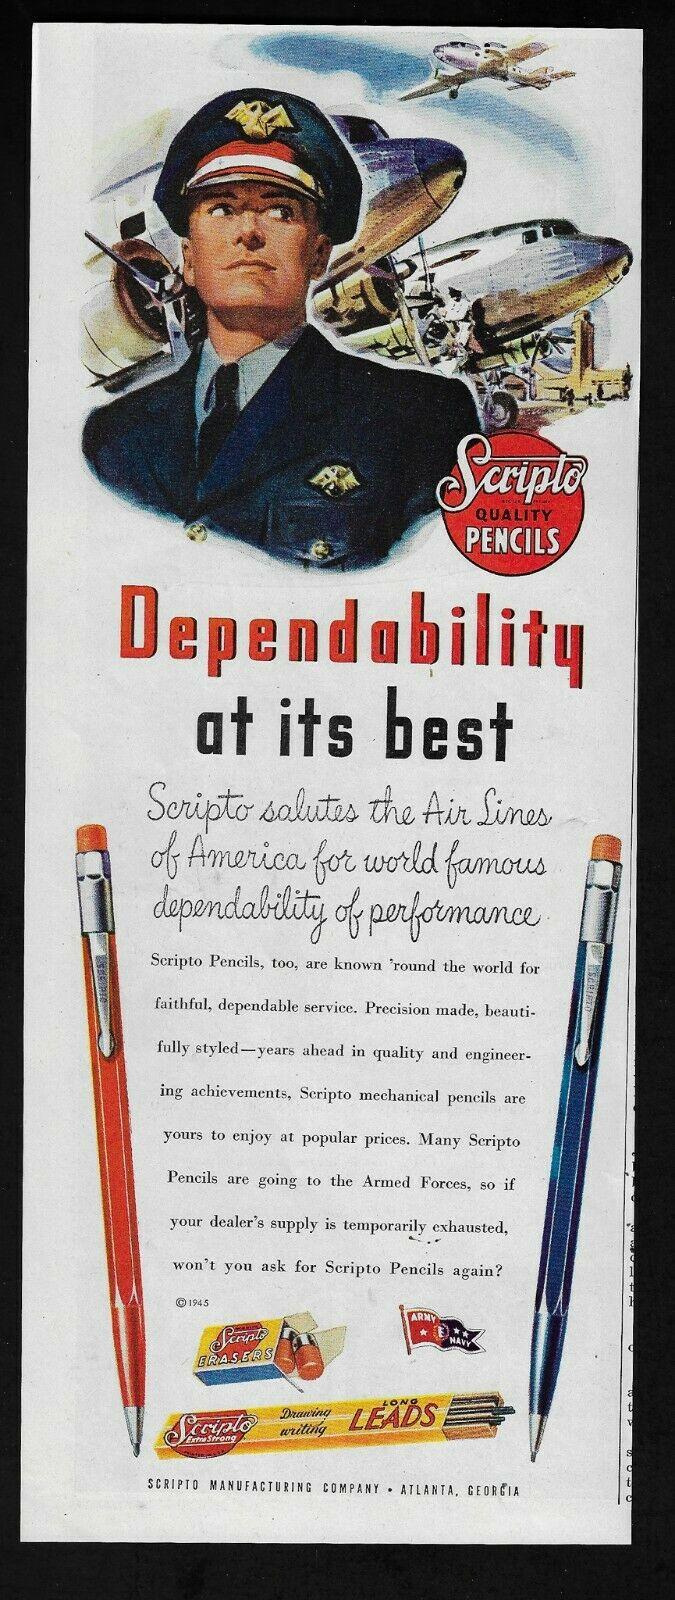 SCRIPTO-1945-pencil-airplane-pilot-war-wwii-illustration.jpg